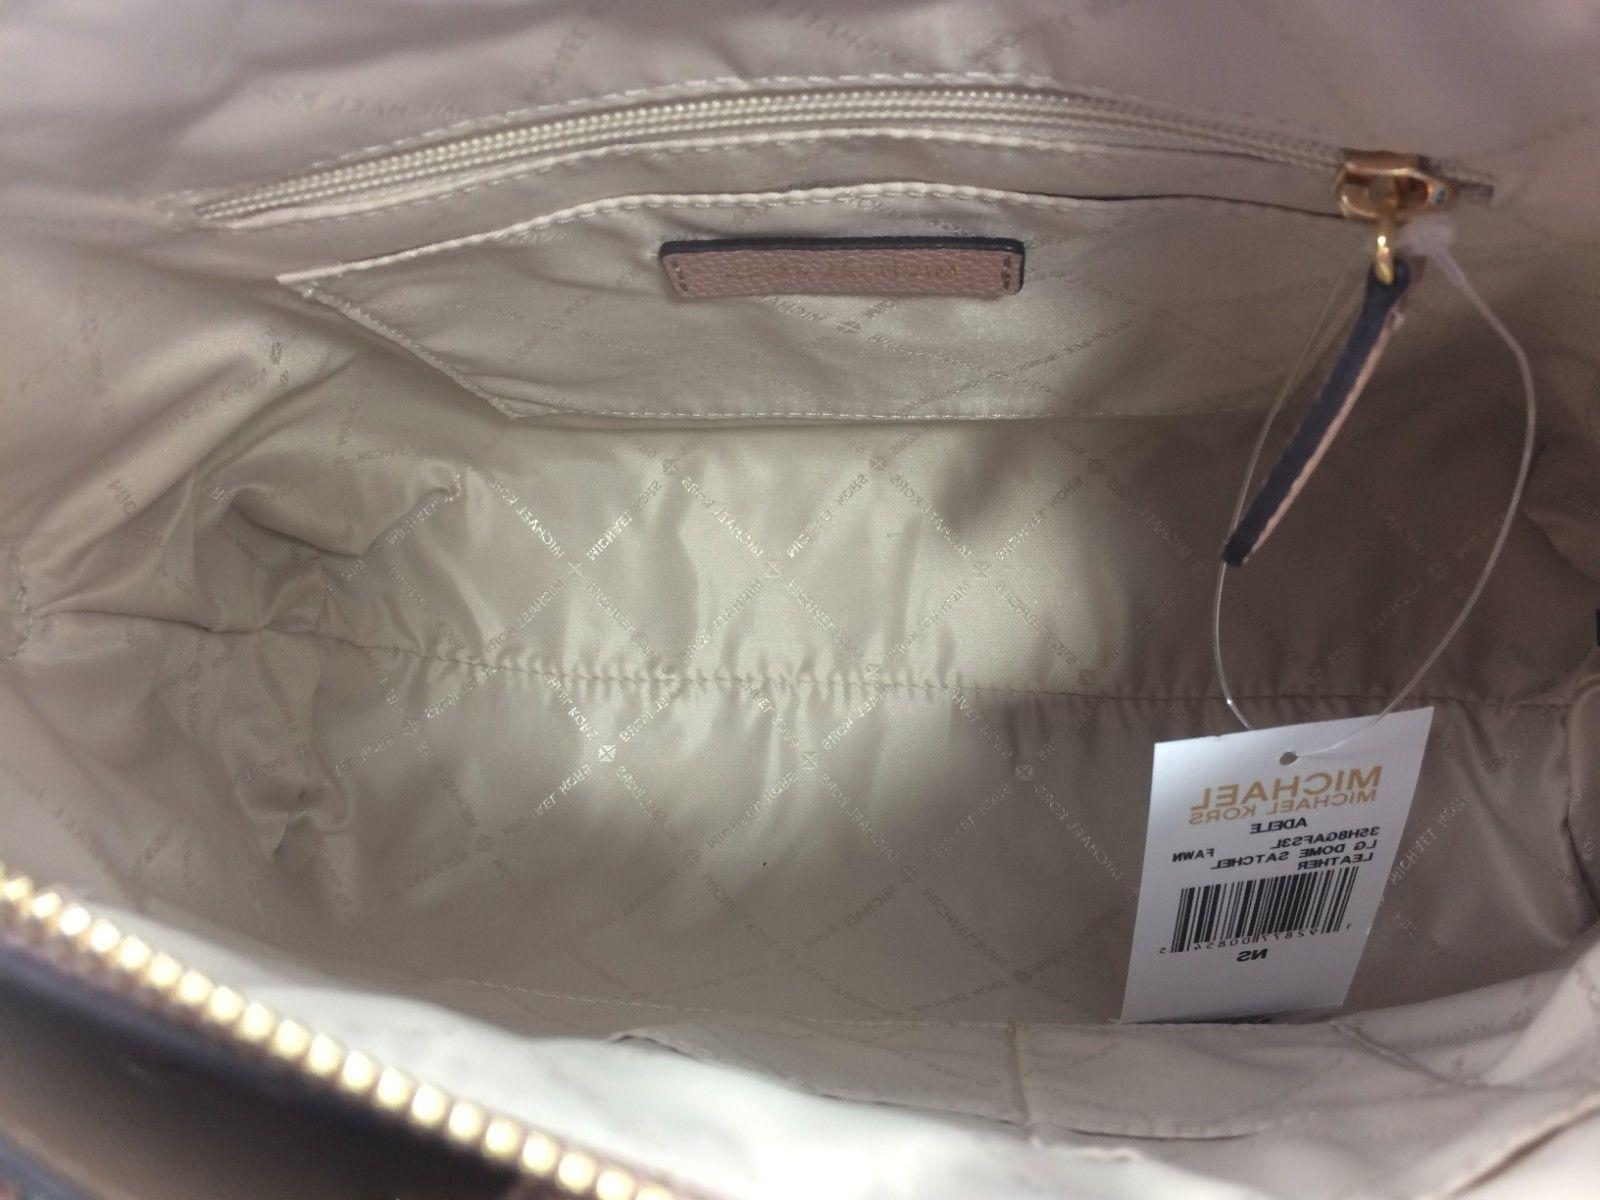 New Authentic Michael Kors Adele Satchel Handbag